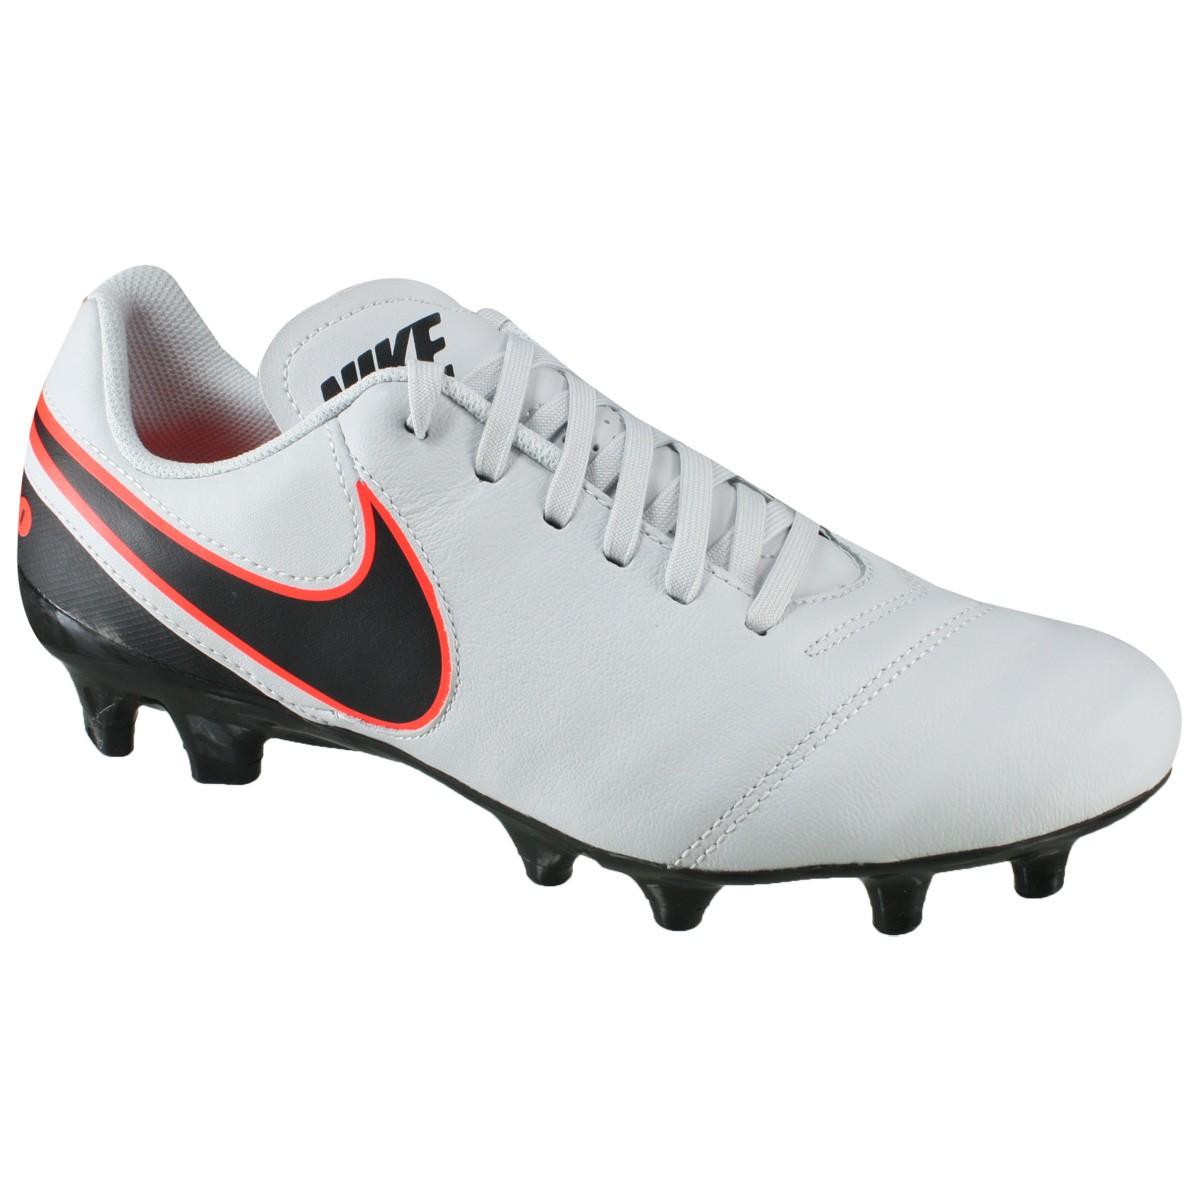 Chuteira Tiempo Genio II Leather FG Nike 819213-001 - Cinza - Botas ... 806a0747cfb16